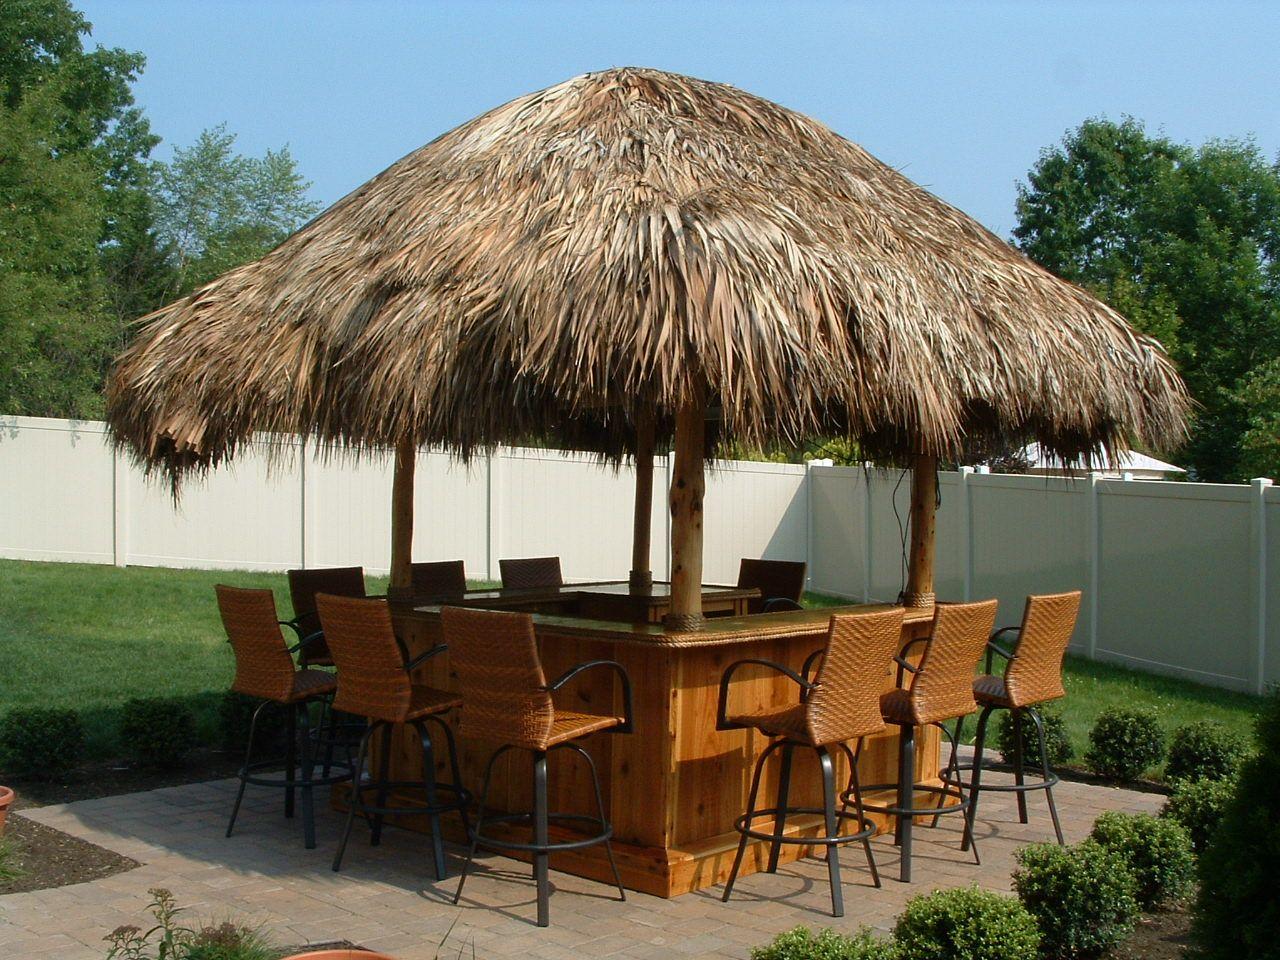 Jackson, NJ - 8x8 Custom Red Cedar Tiki Bar, 12x12 thatched roof ...